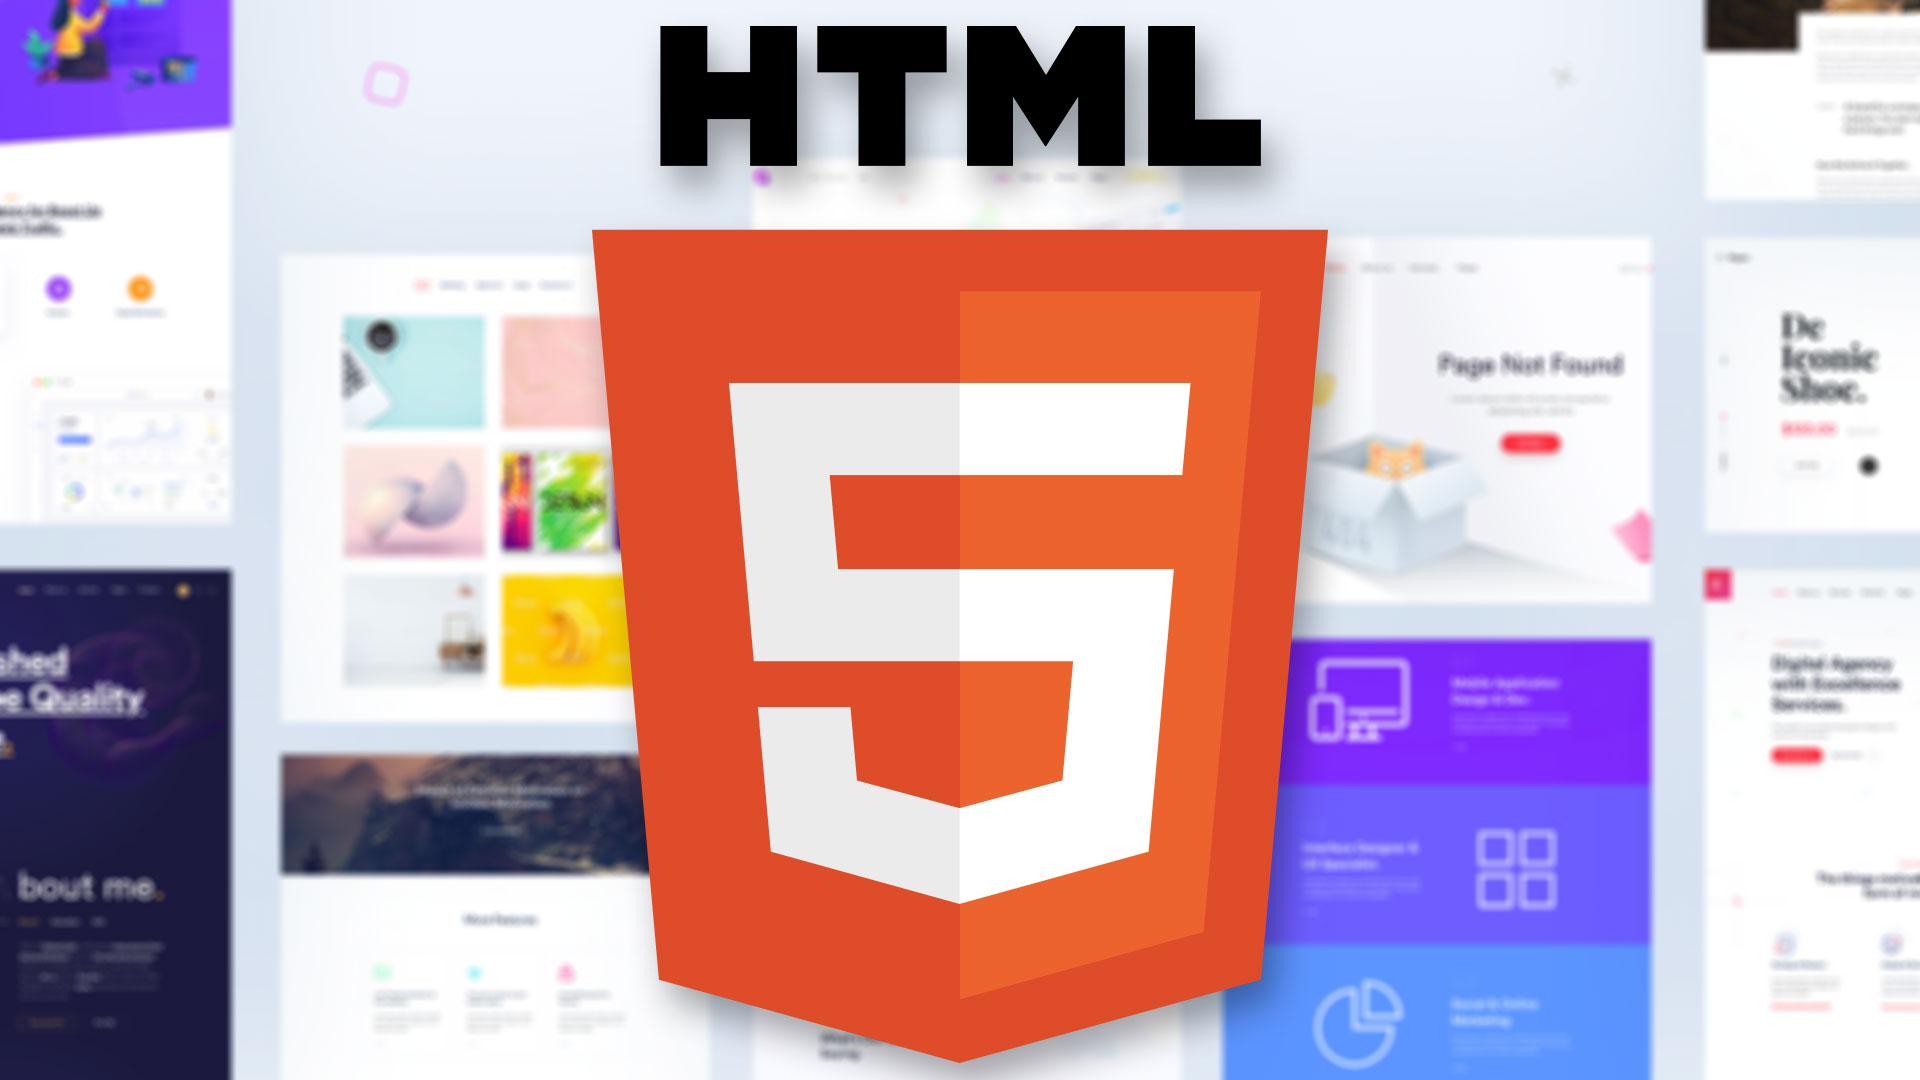 The 10 best HTML5 template designs | Creative Bloq